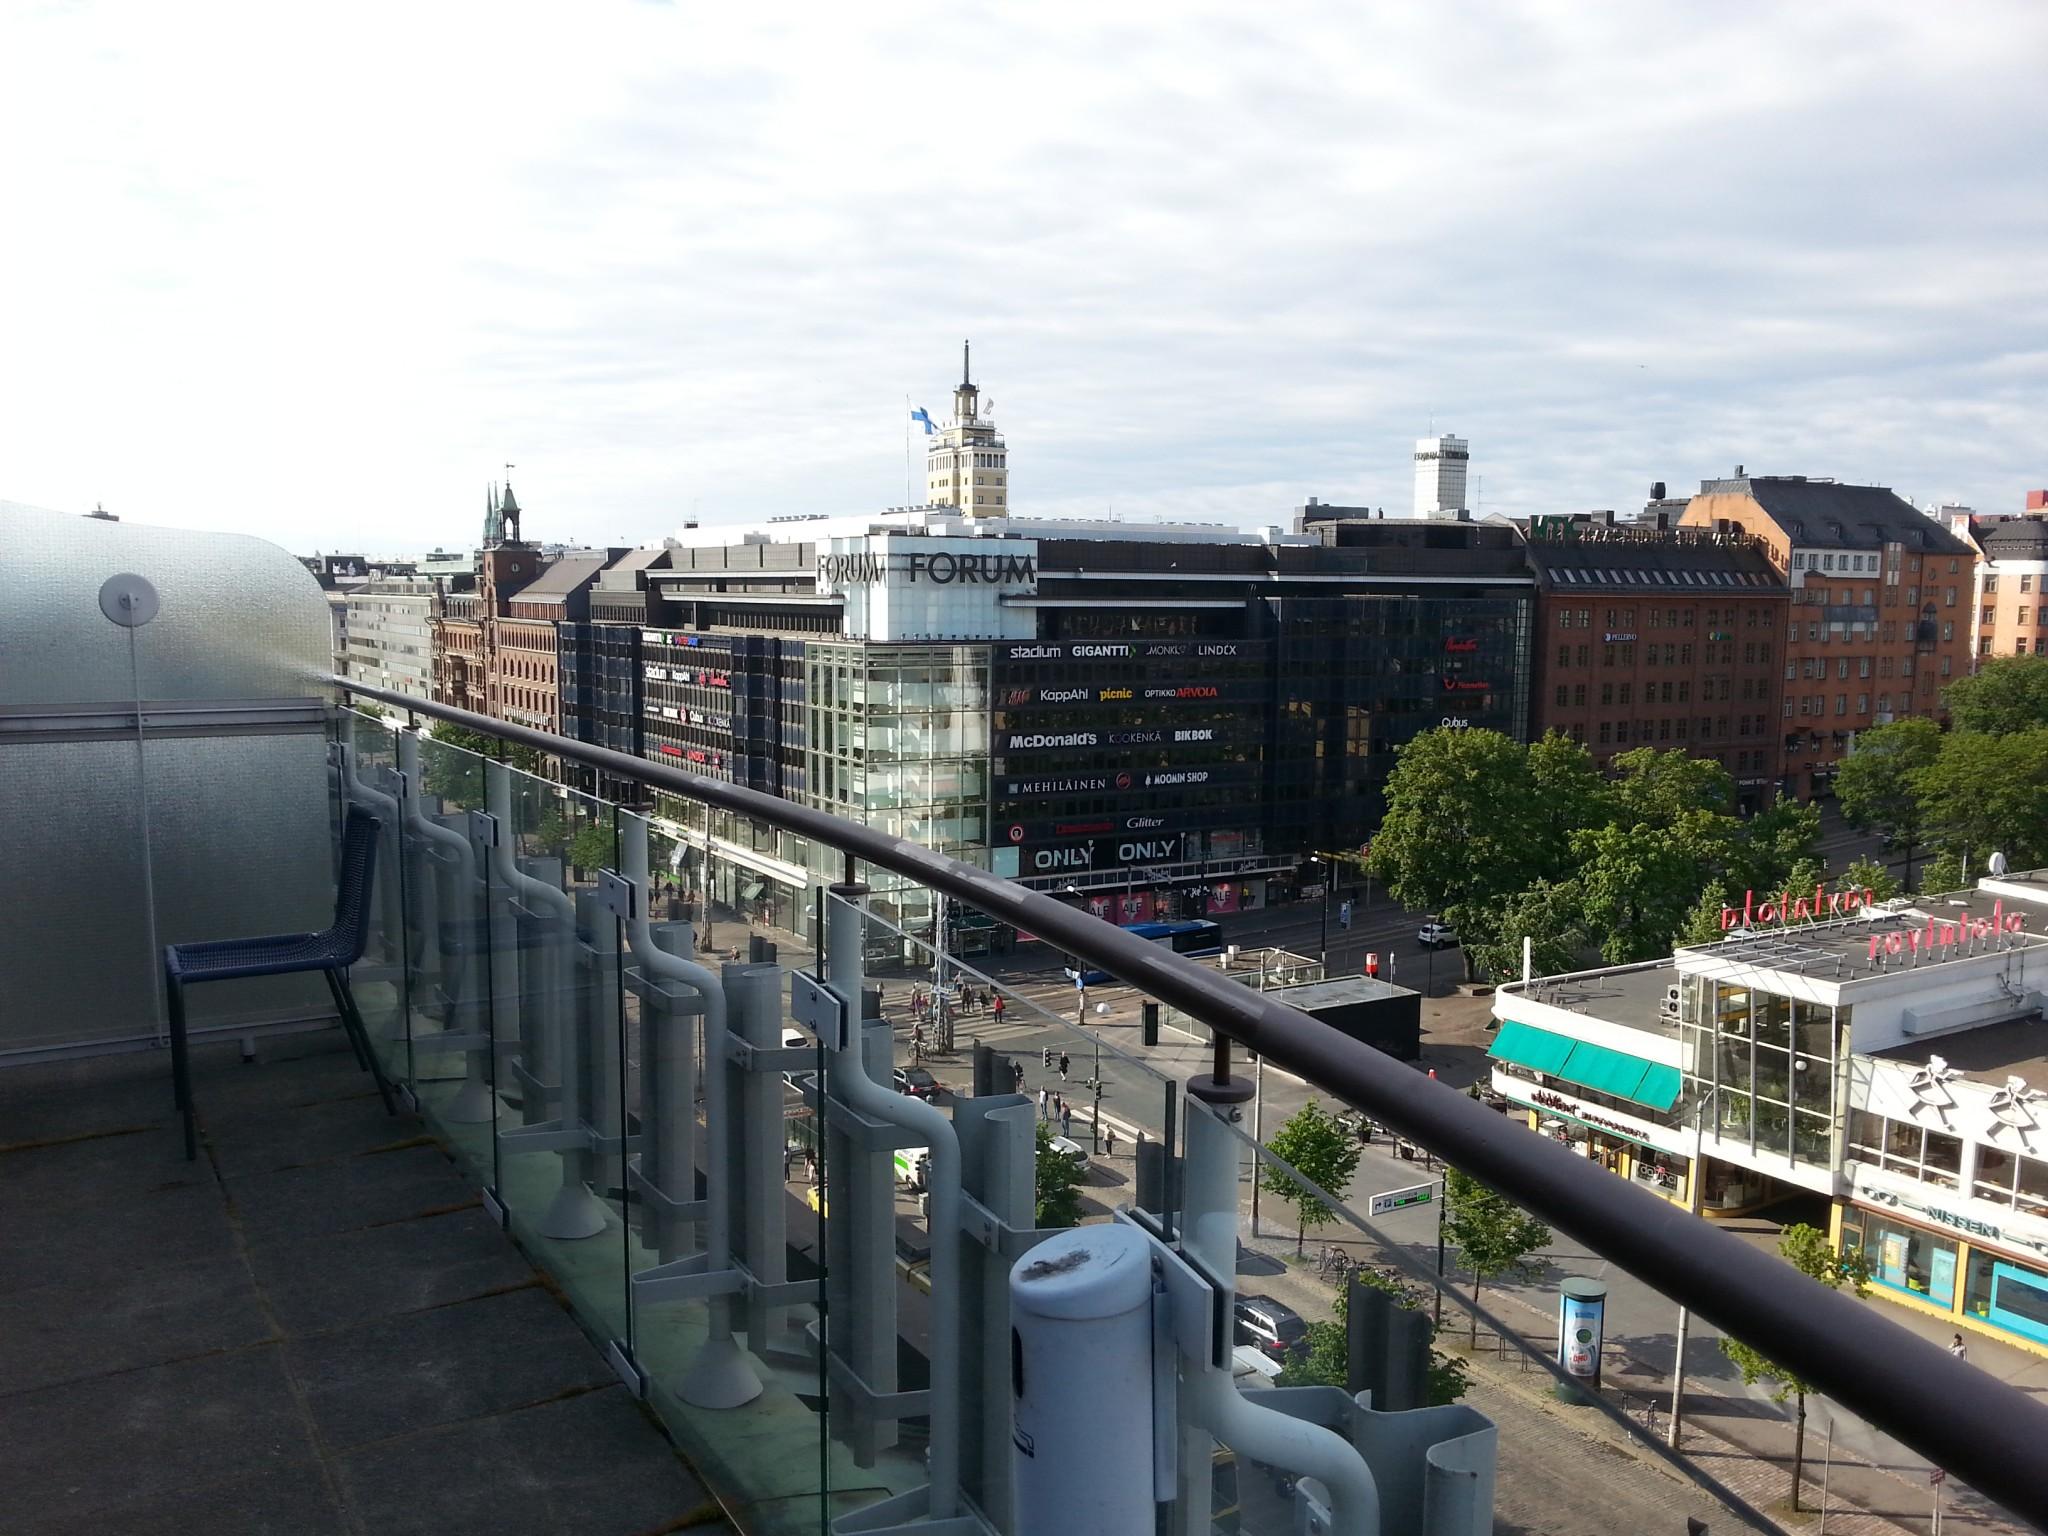 Directions to Original Sokos Hotel Vaakuna (Helsinki) with public transportation